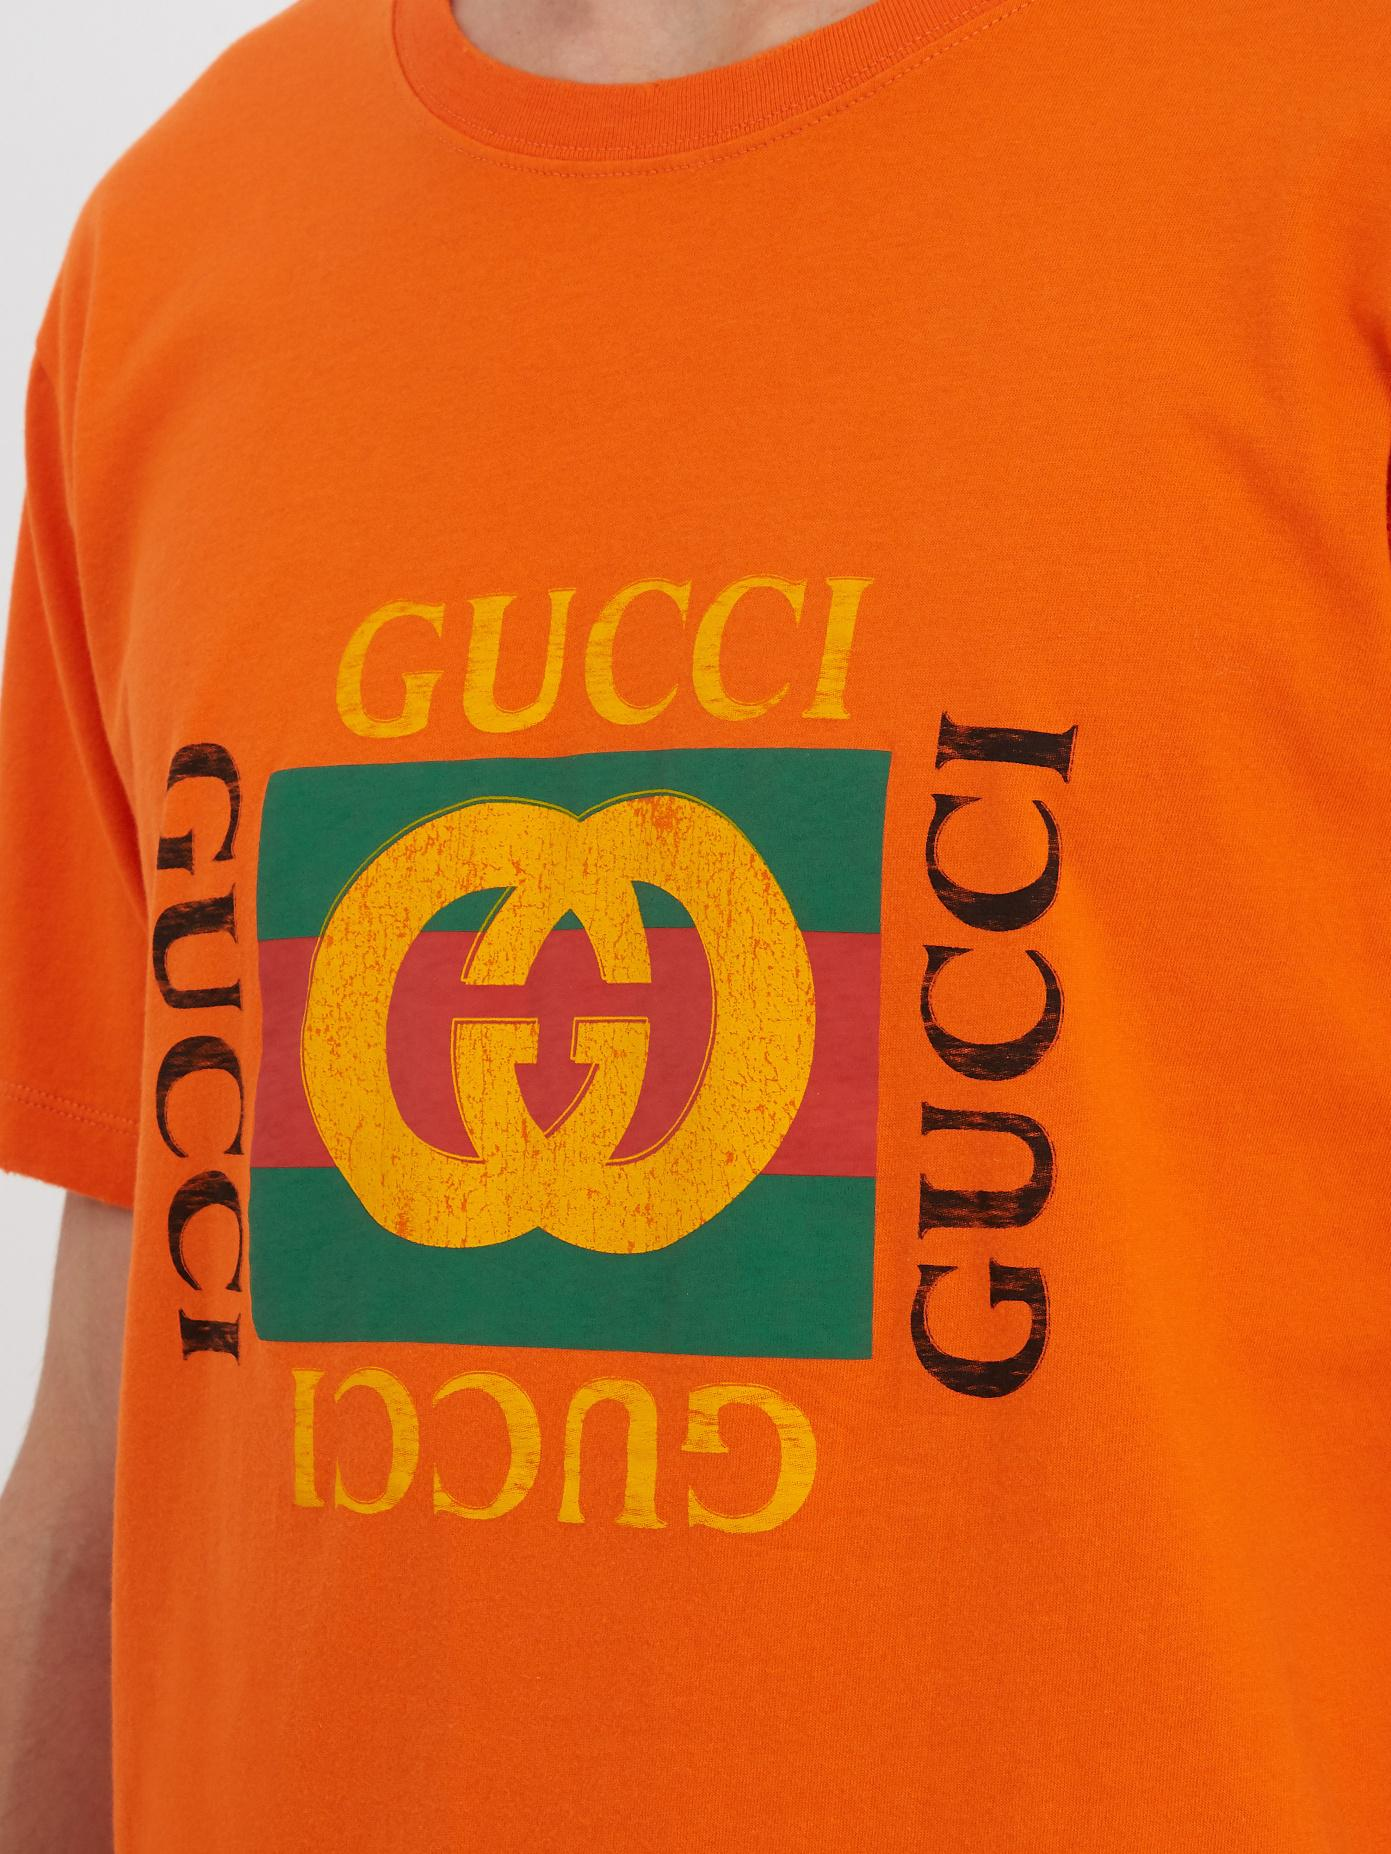 ebf9be3a84745 Lyst - Gucci Logo Cotton T-shirt in Orange for Men